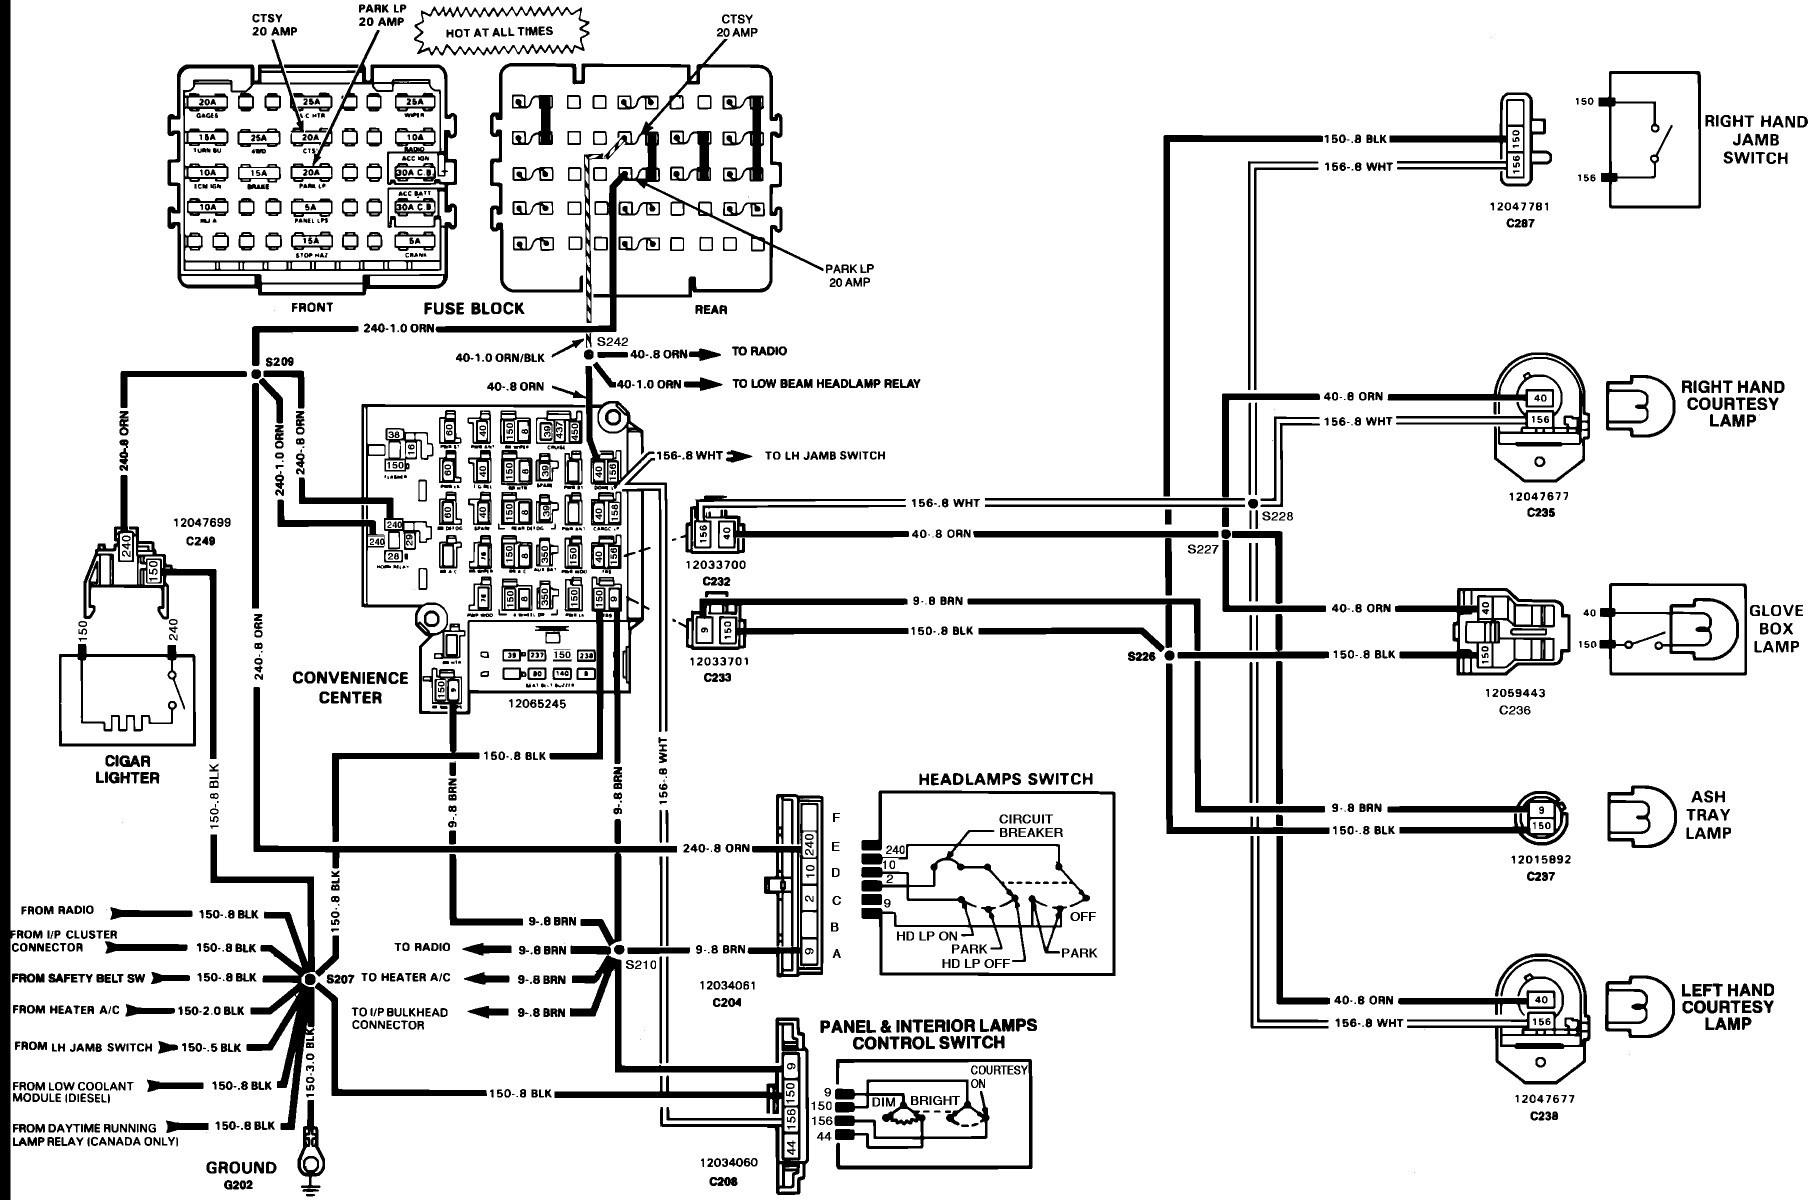 06 Silverado Tail Light Wiring Diagram | Wiring Diagram - Tail Light Wiring Diagram 1995 Chevy Truck